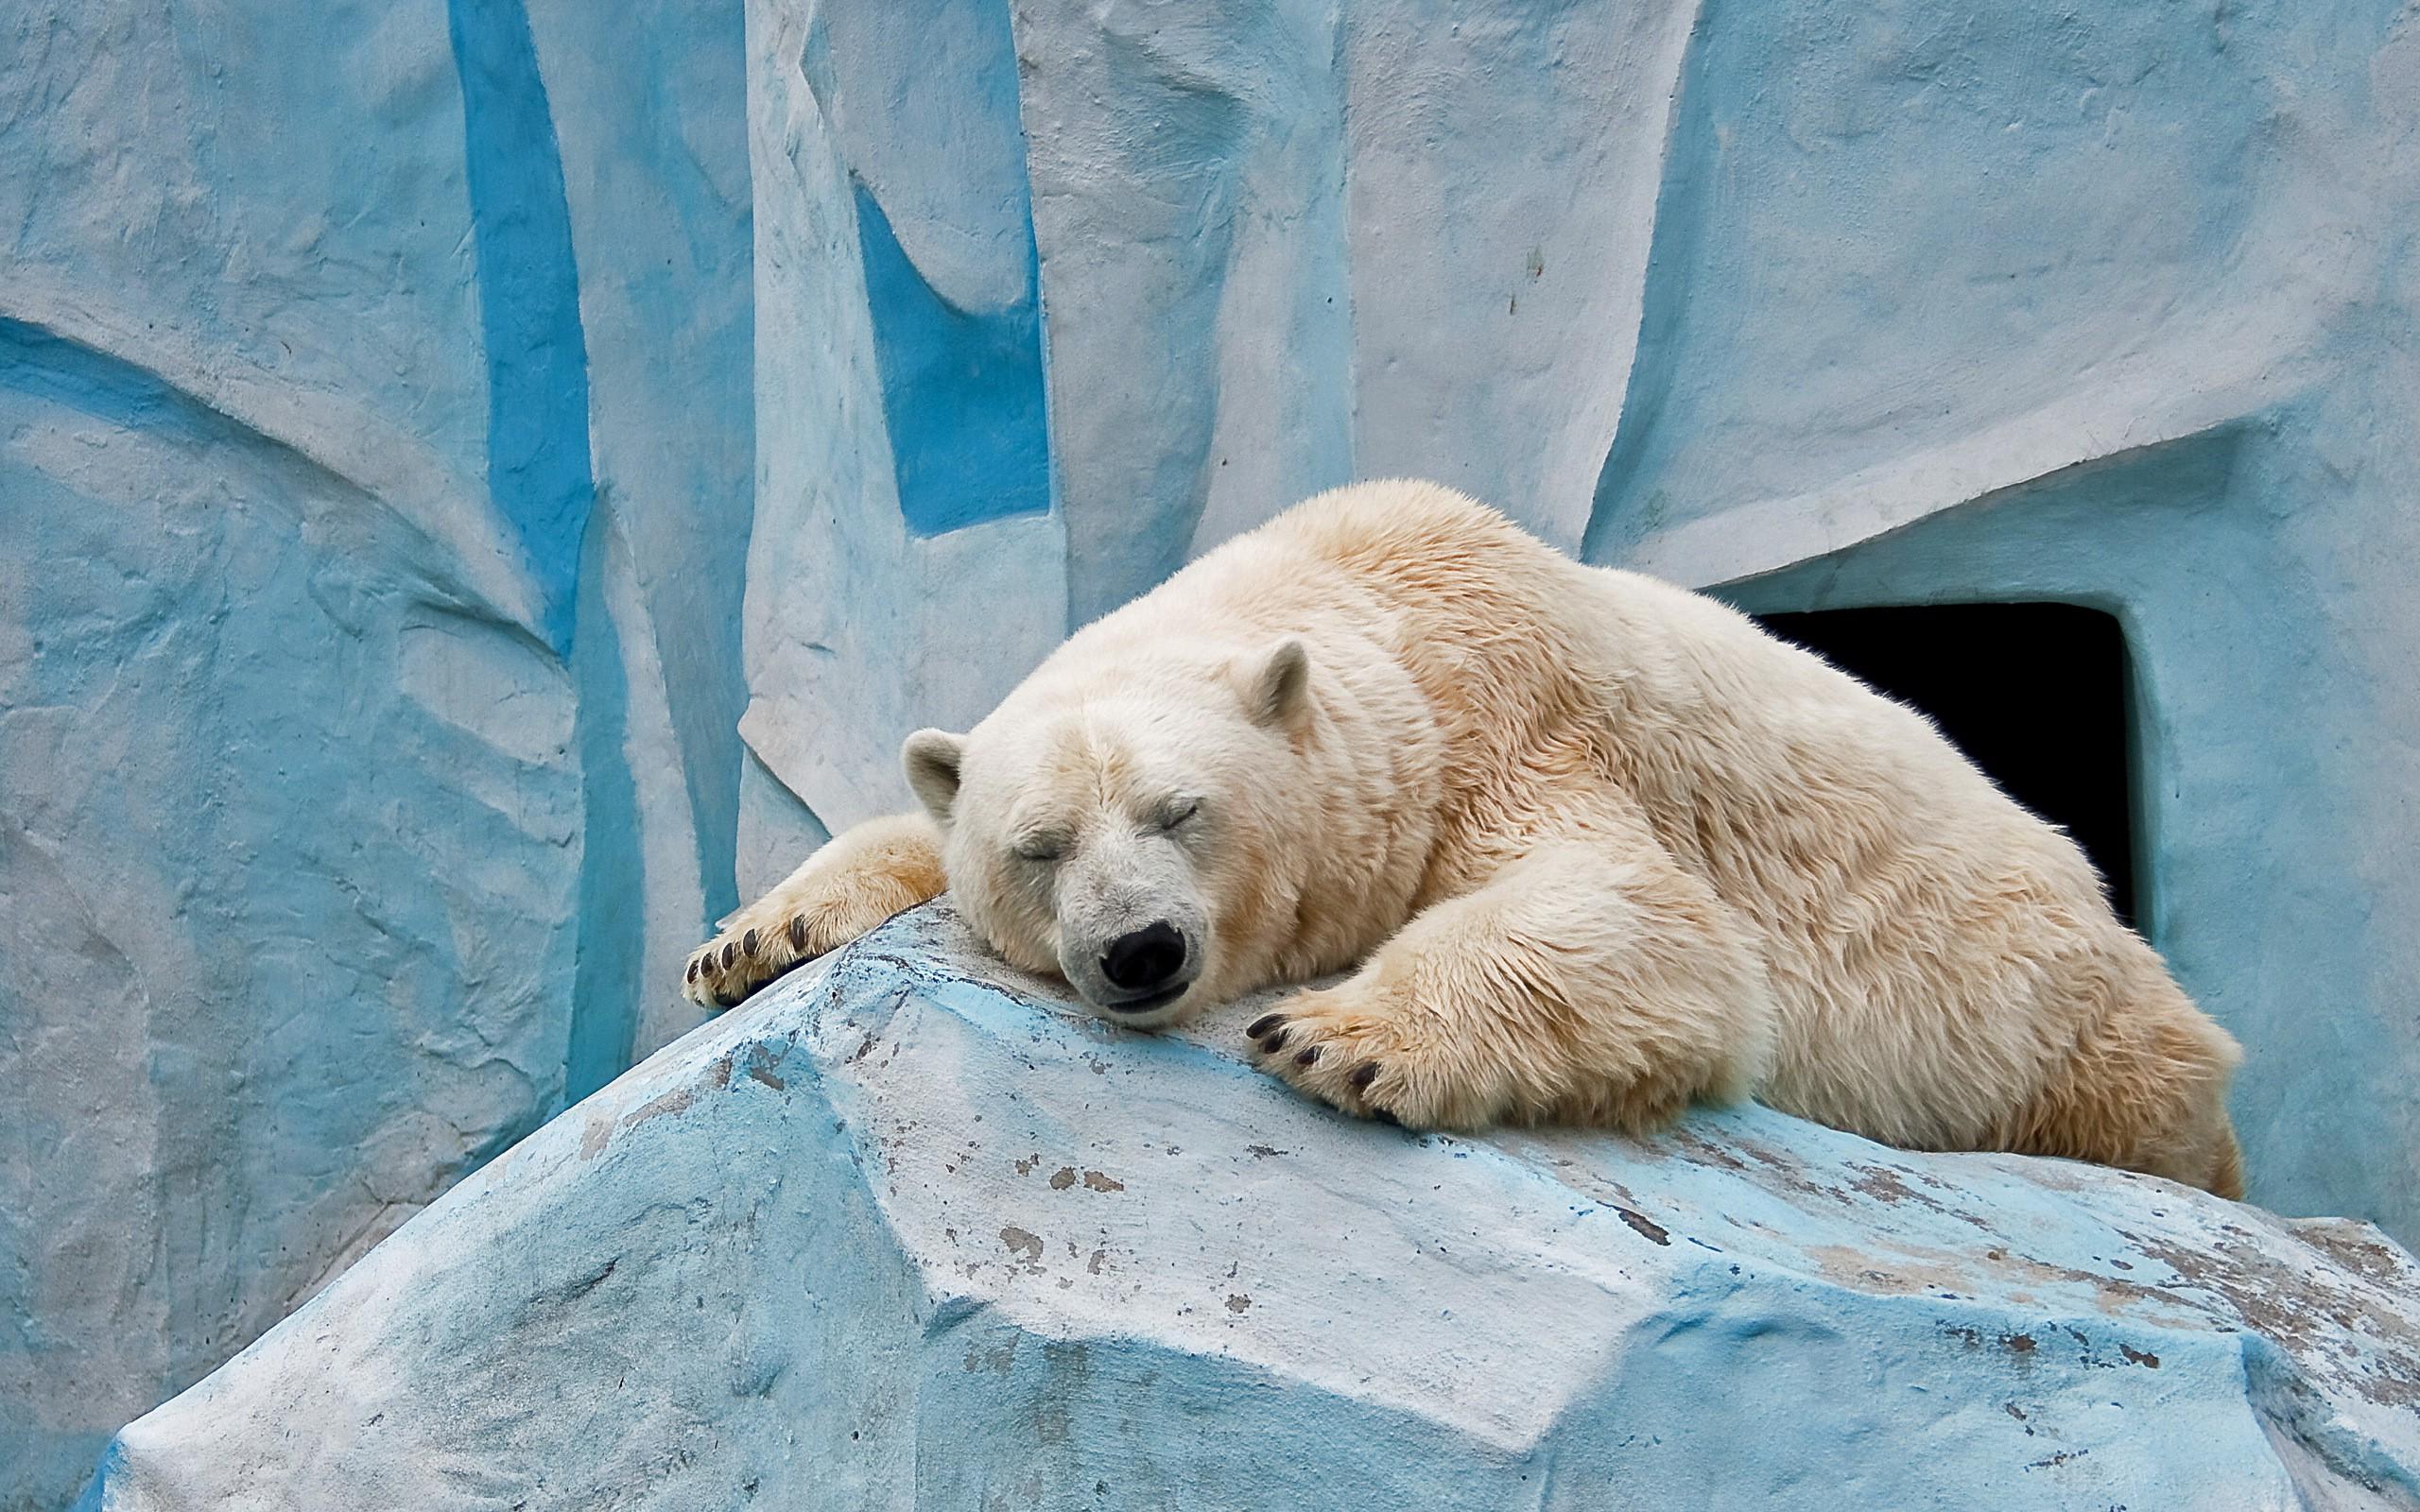 wallpaper : animals, nature, winter, blue, polar bears, zoo, arctic